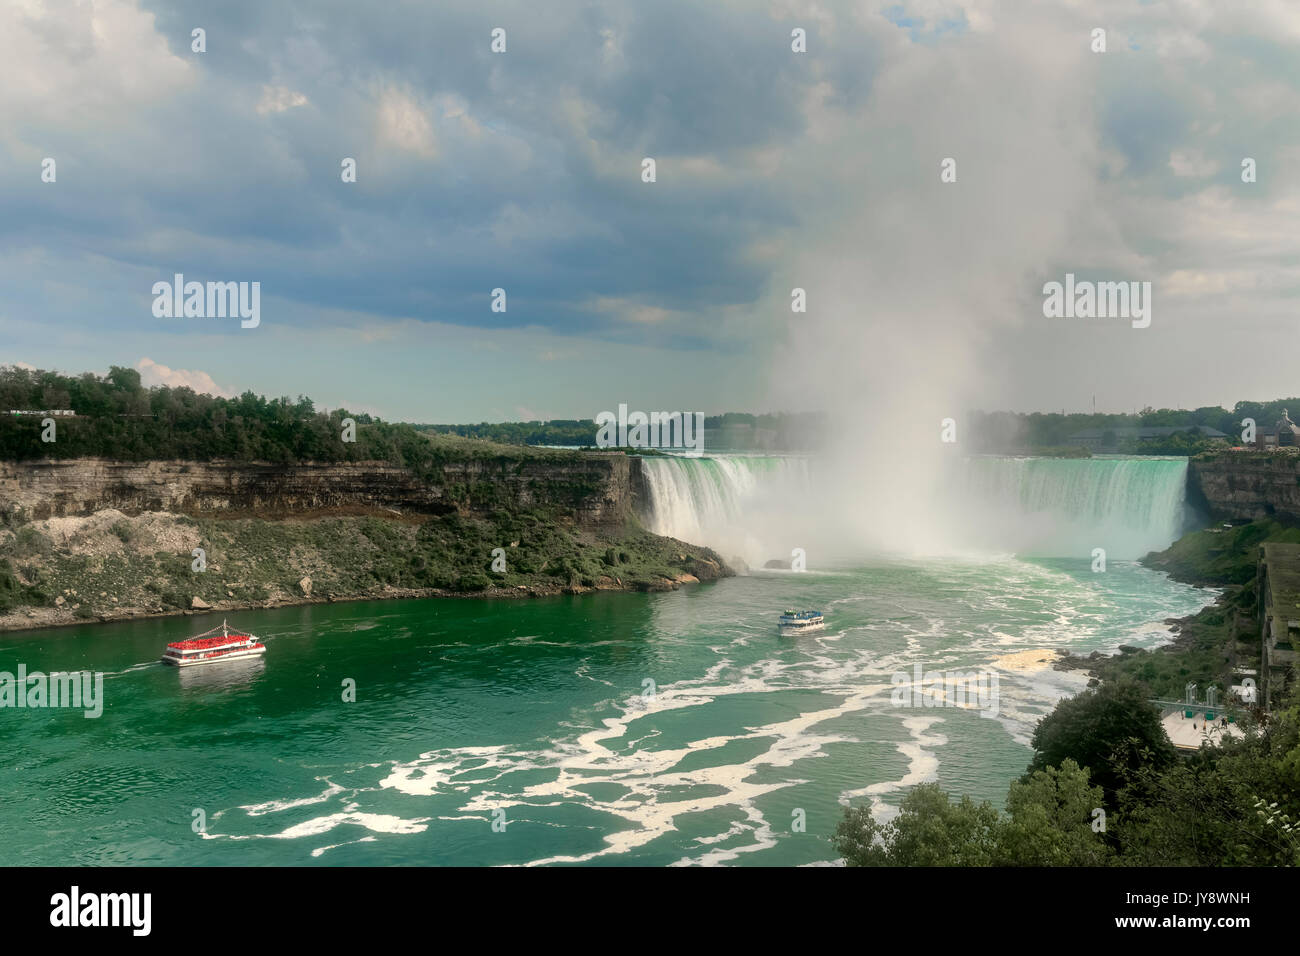 Niagara Falls, Ontario, New York, Canada, United States - Stock Image